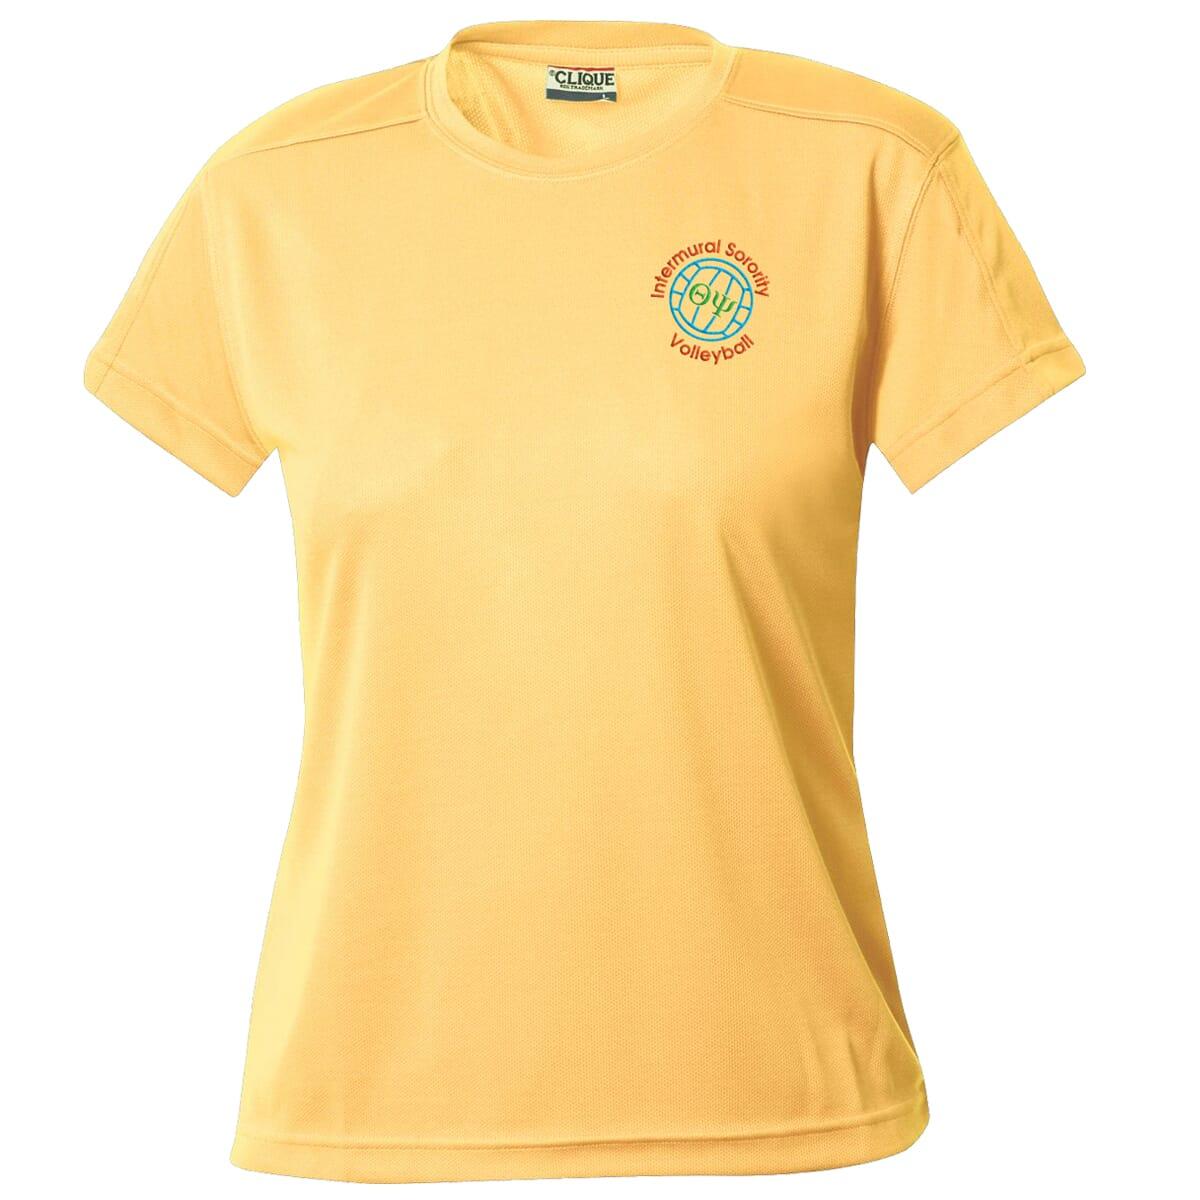 Athletic yellow t-shirt